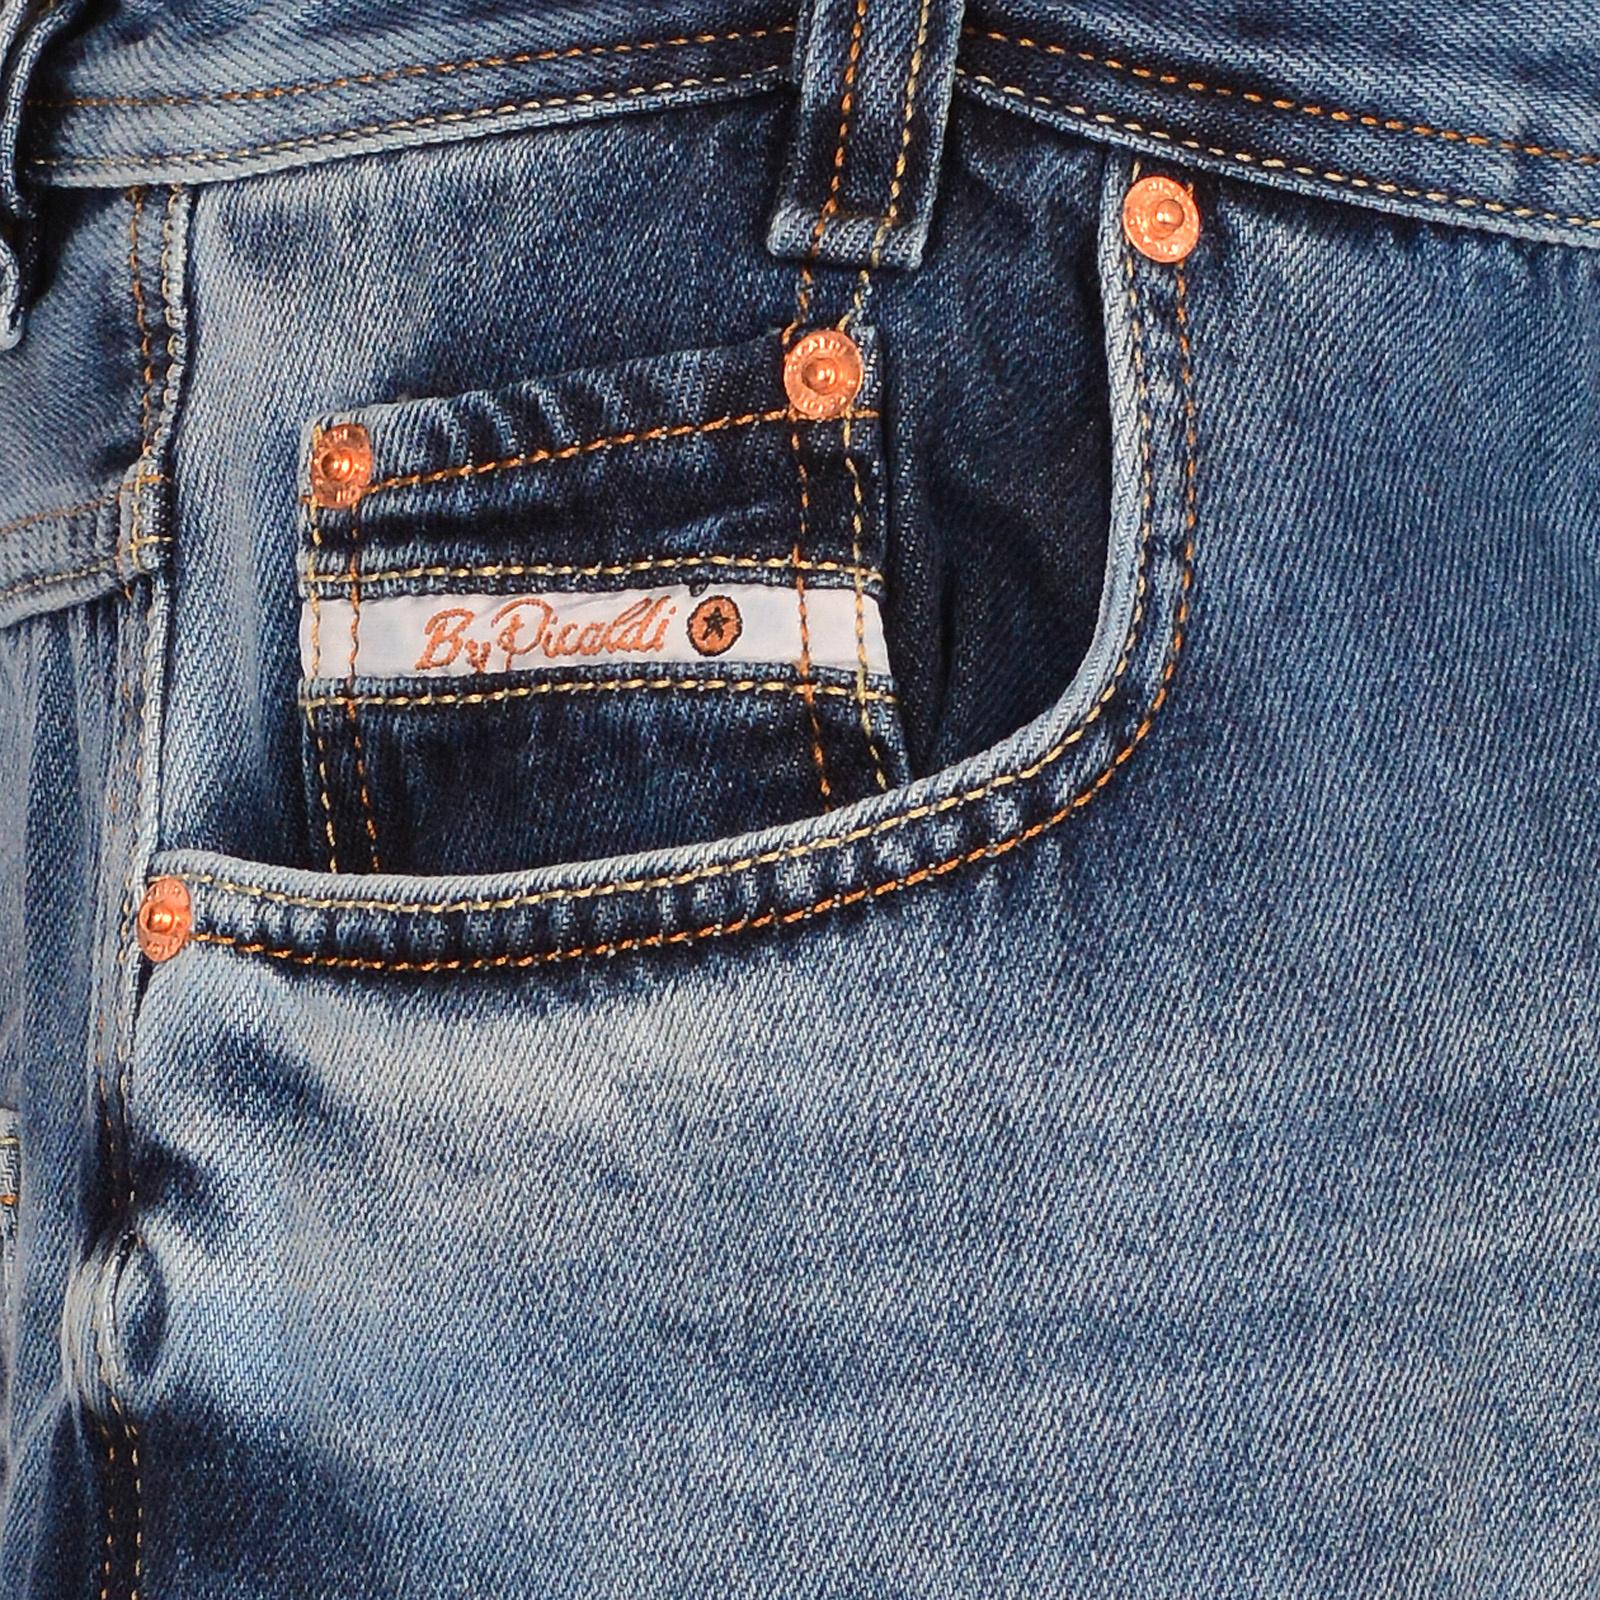 Picaldi Zicco 472 Jeans - Sixtyfive